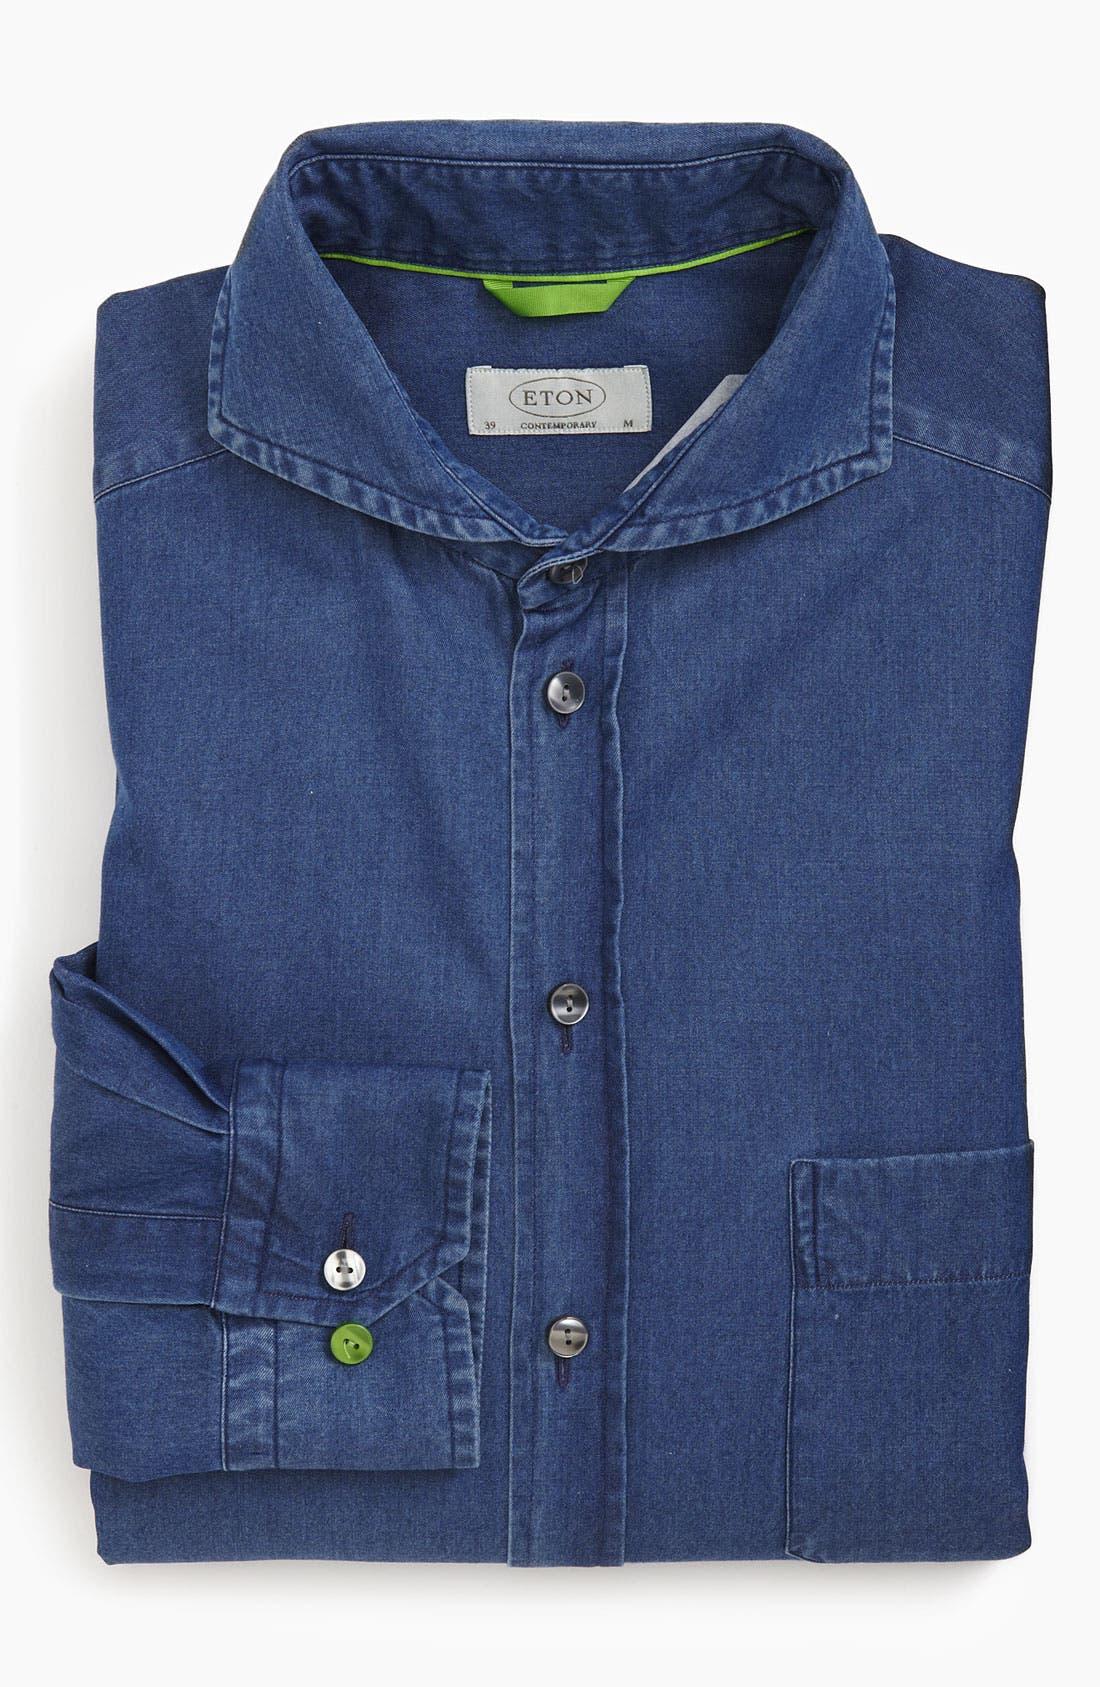 Alternate Image 1 Selected - Eton Contemporary Fit Denim Non-Iron Dress Shirt